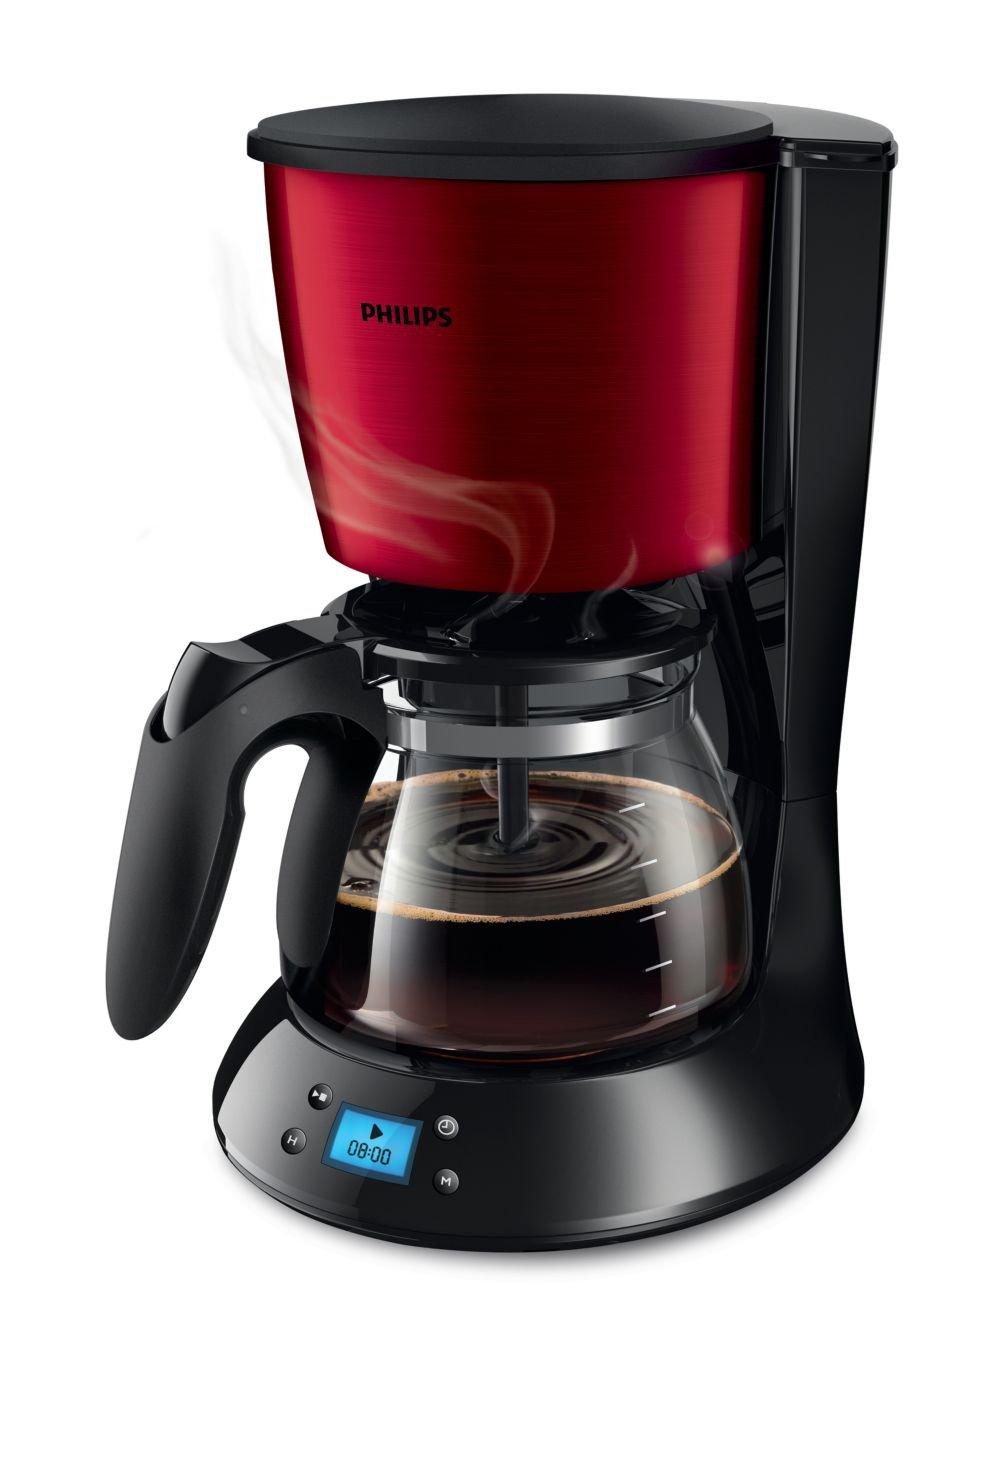 Philips Daily Collection HD7459/61autonome–Cafetière (autonome, Cafetière à Filtre, 1,2l, de café moulu, 1000W, noir, rouge)